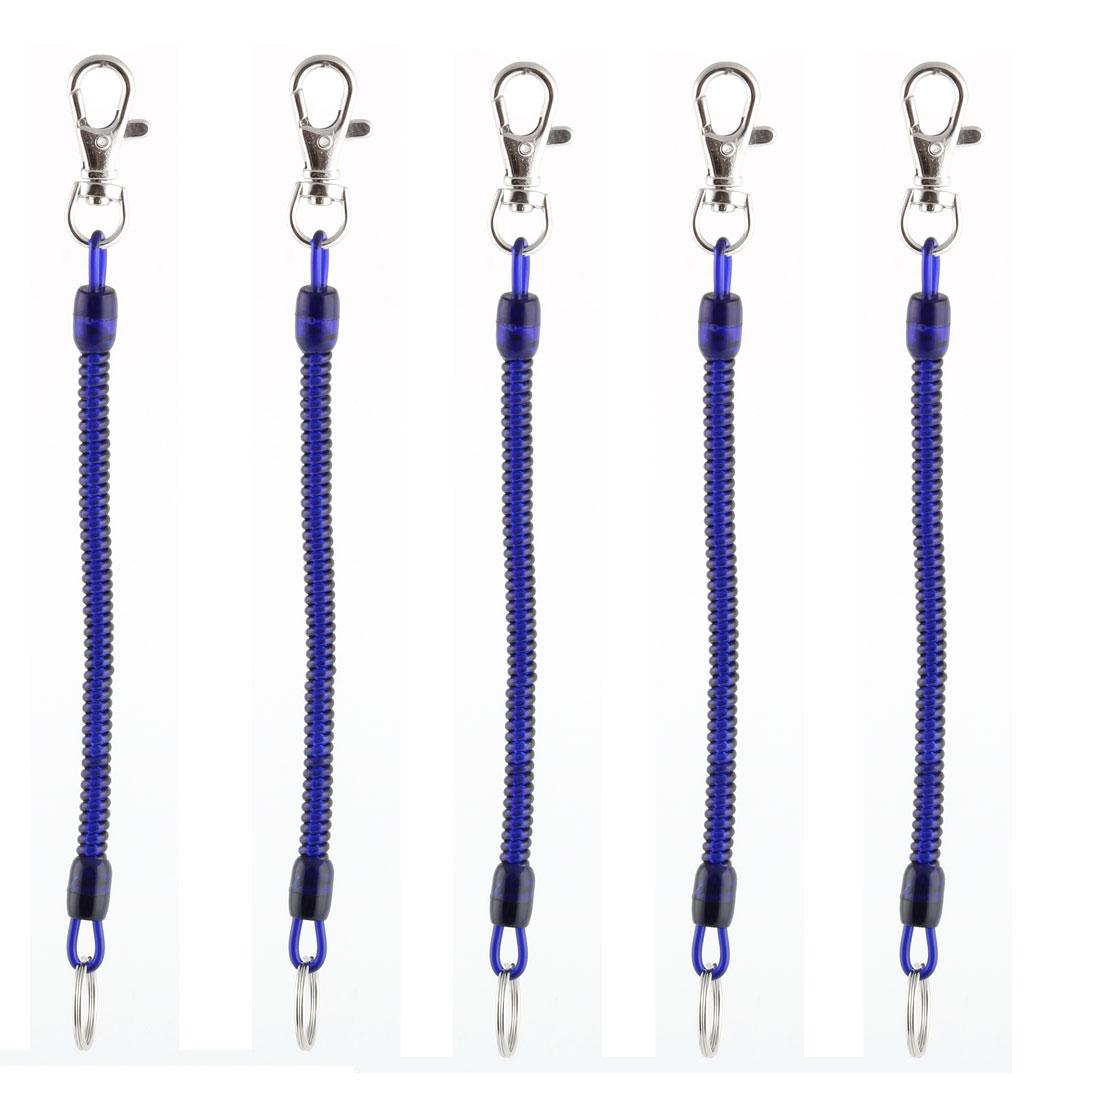 Unisex Plastic Elastic Portable Spring Coil Keychain Dark Blue Silver Tone 5pcs